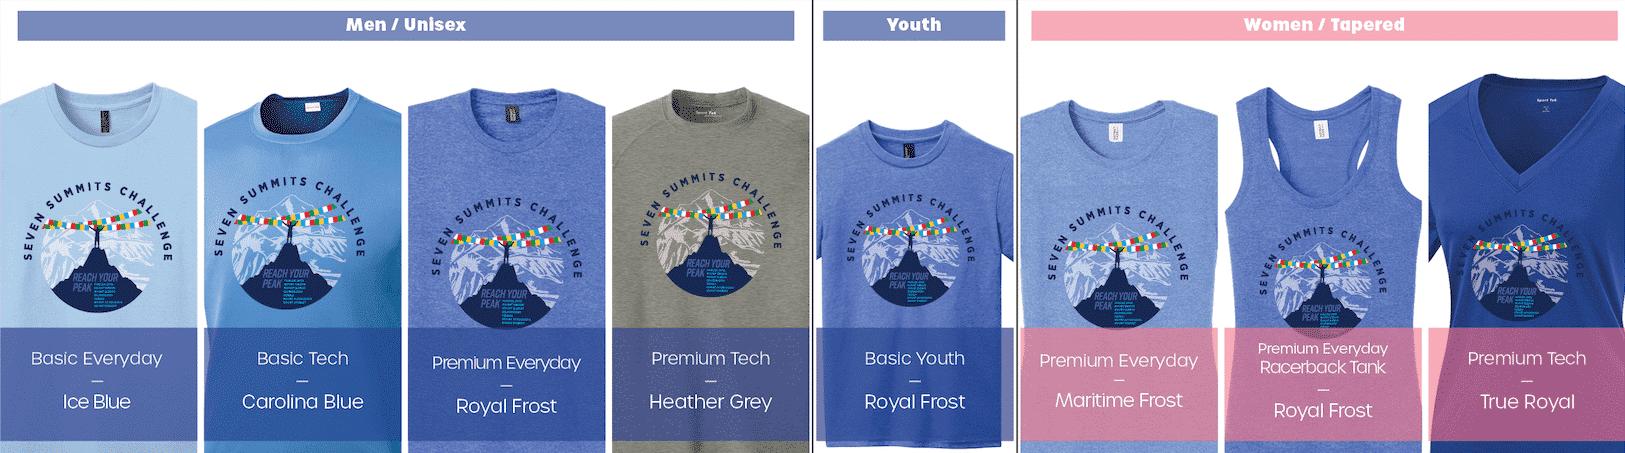 Shirt Options - 7 Summits Series